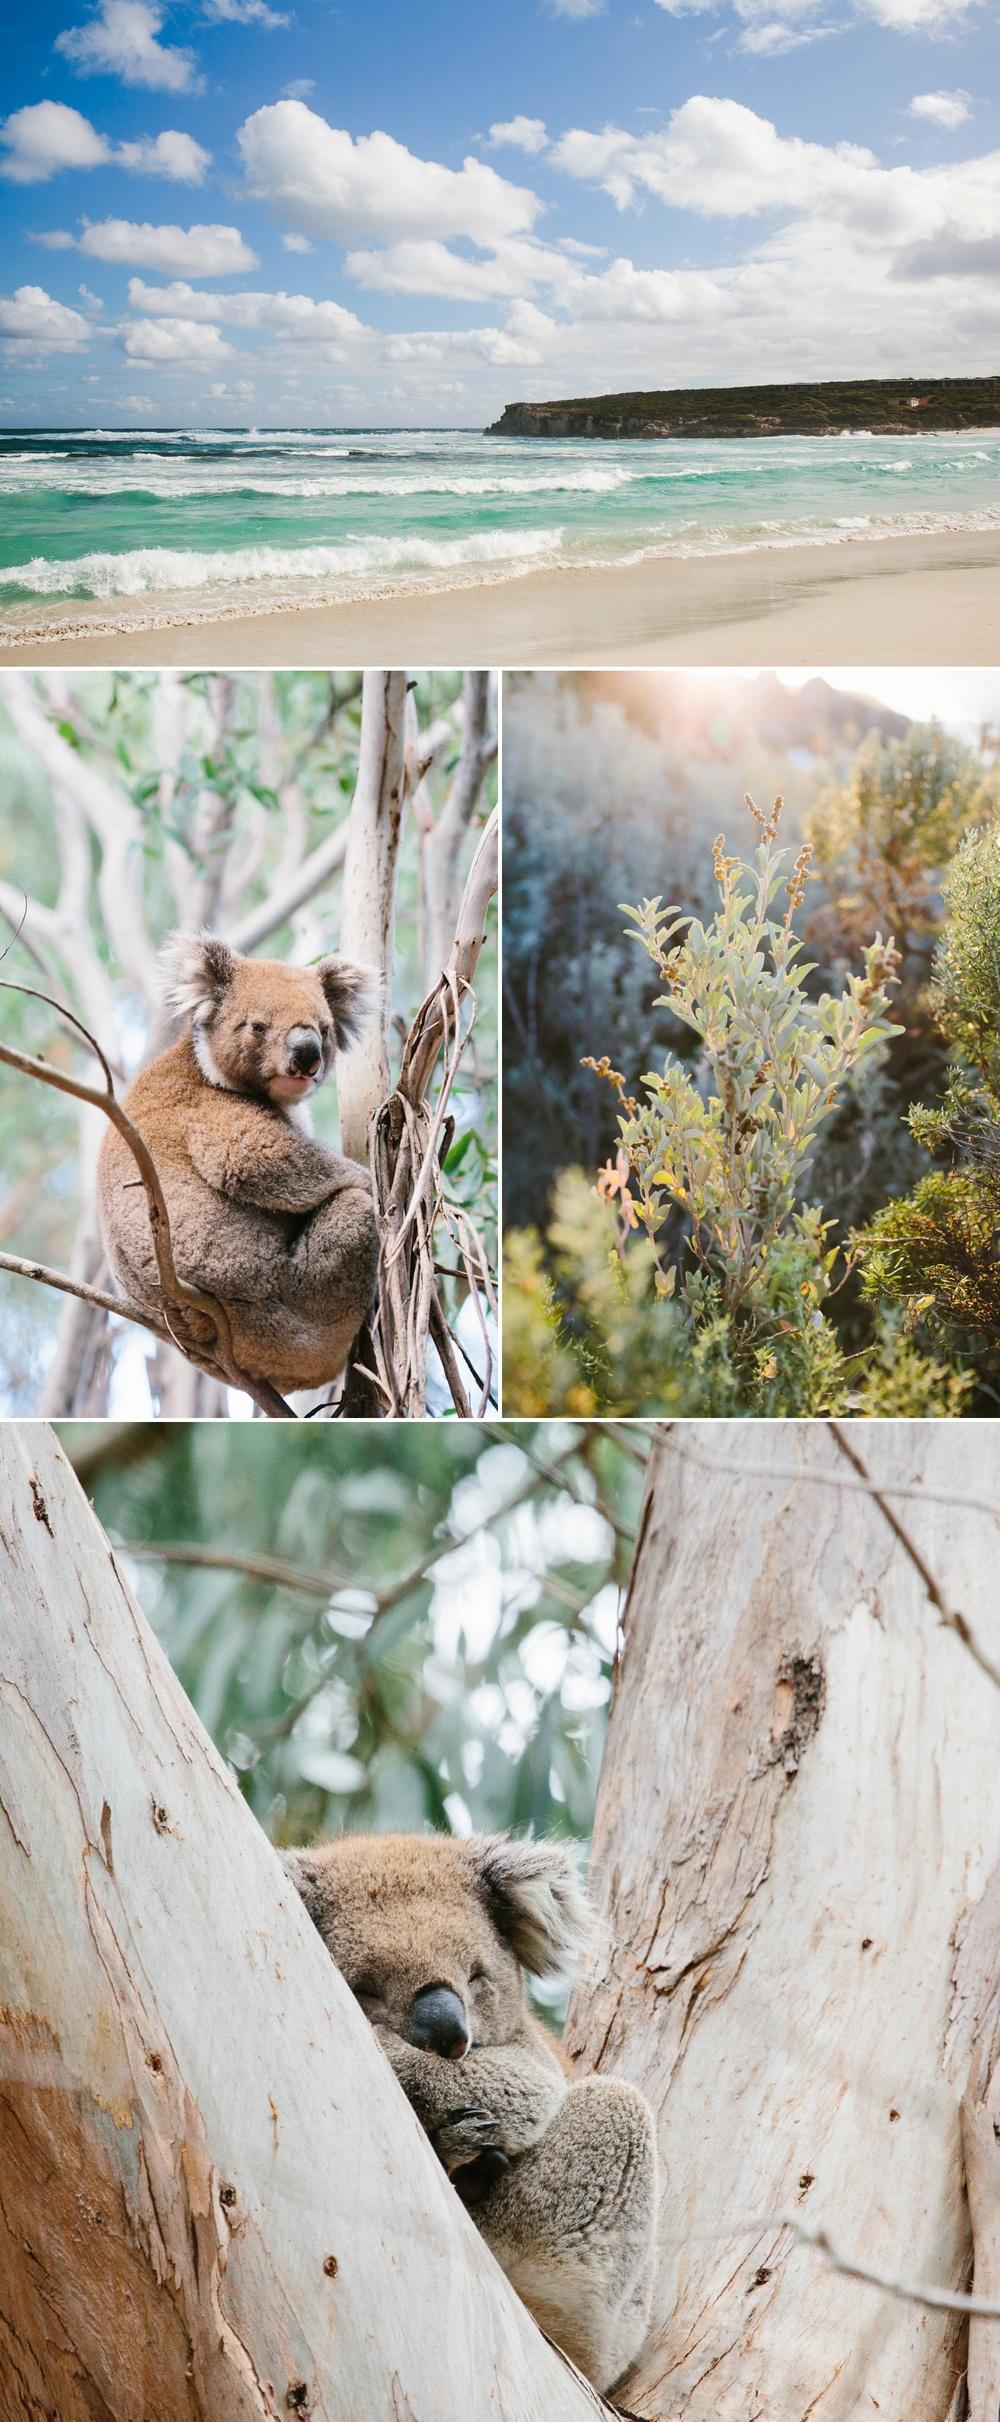 cameron-zegers-seattle-photographer-kangaroo-island-australia-travel_0002.jpg